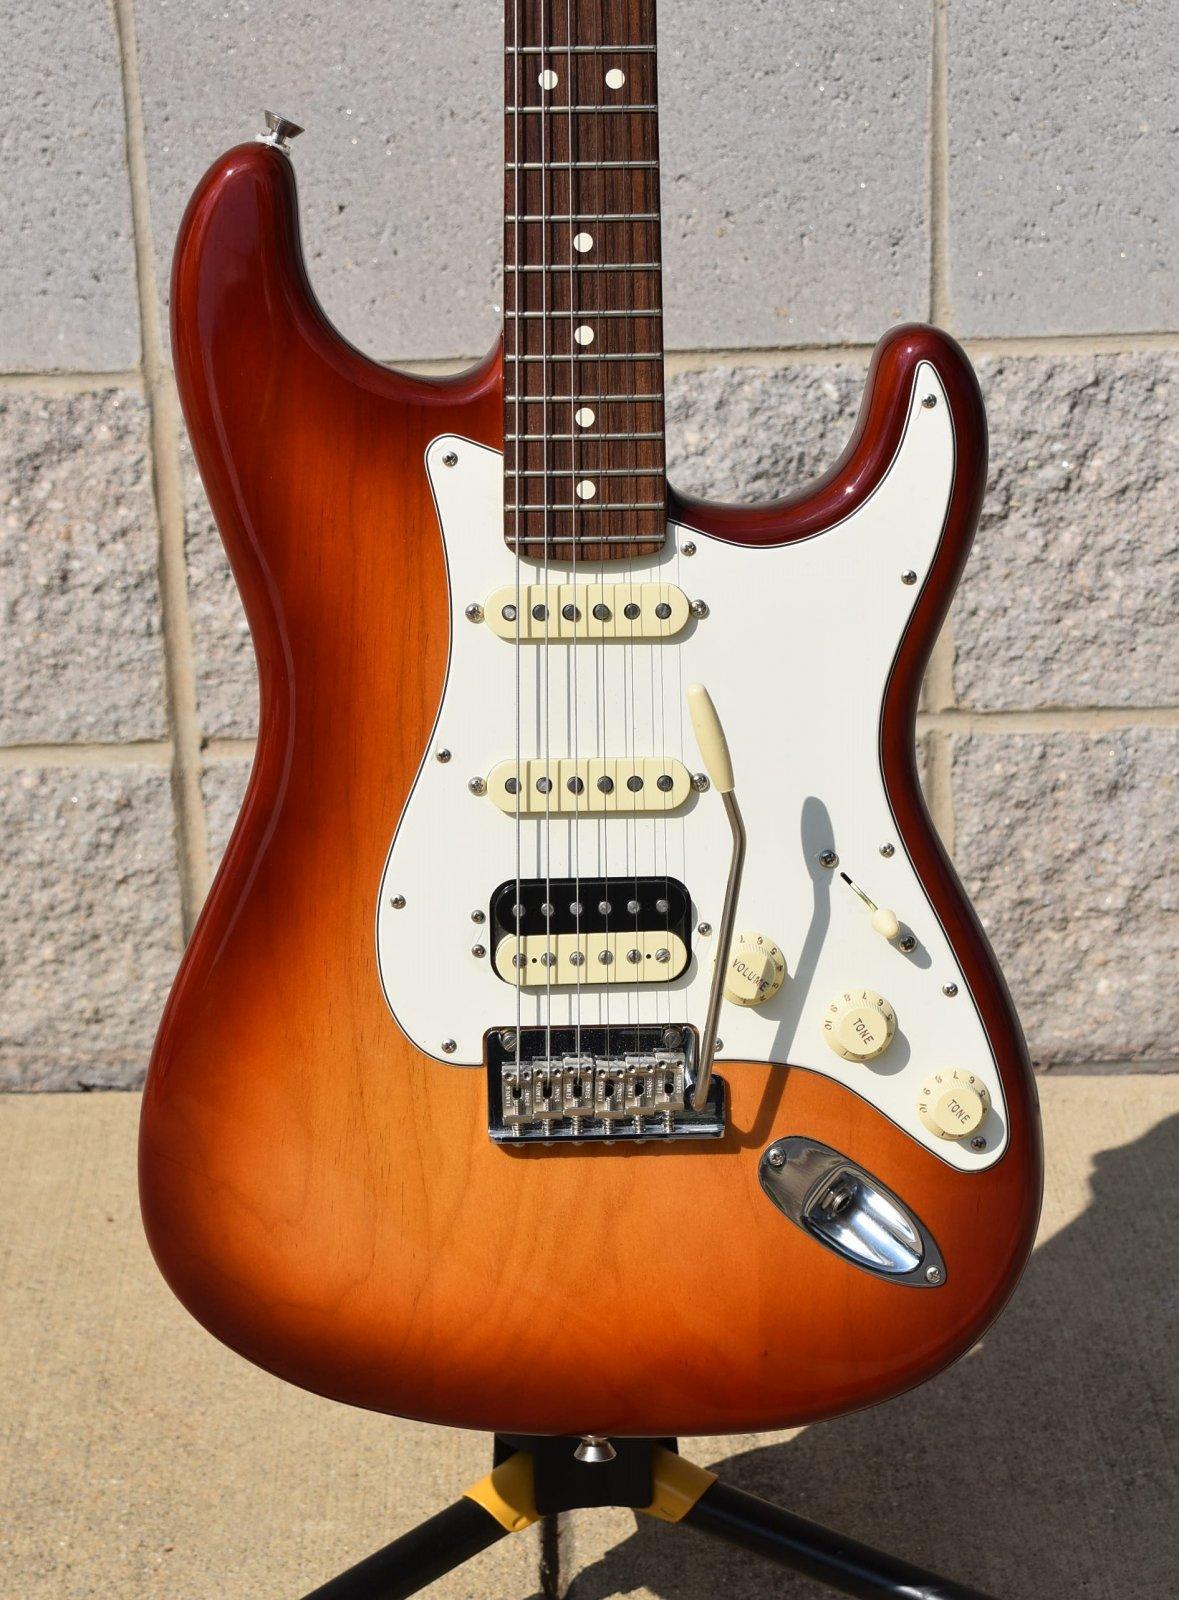 2017 American Professional Stratocaster - Sienna Sunburst